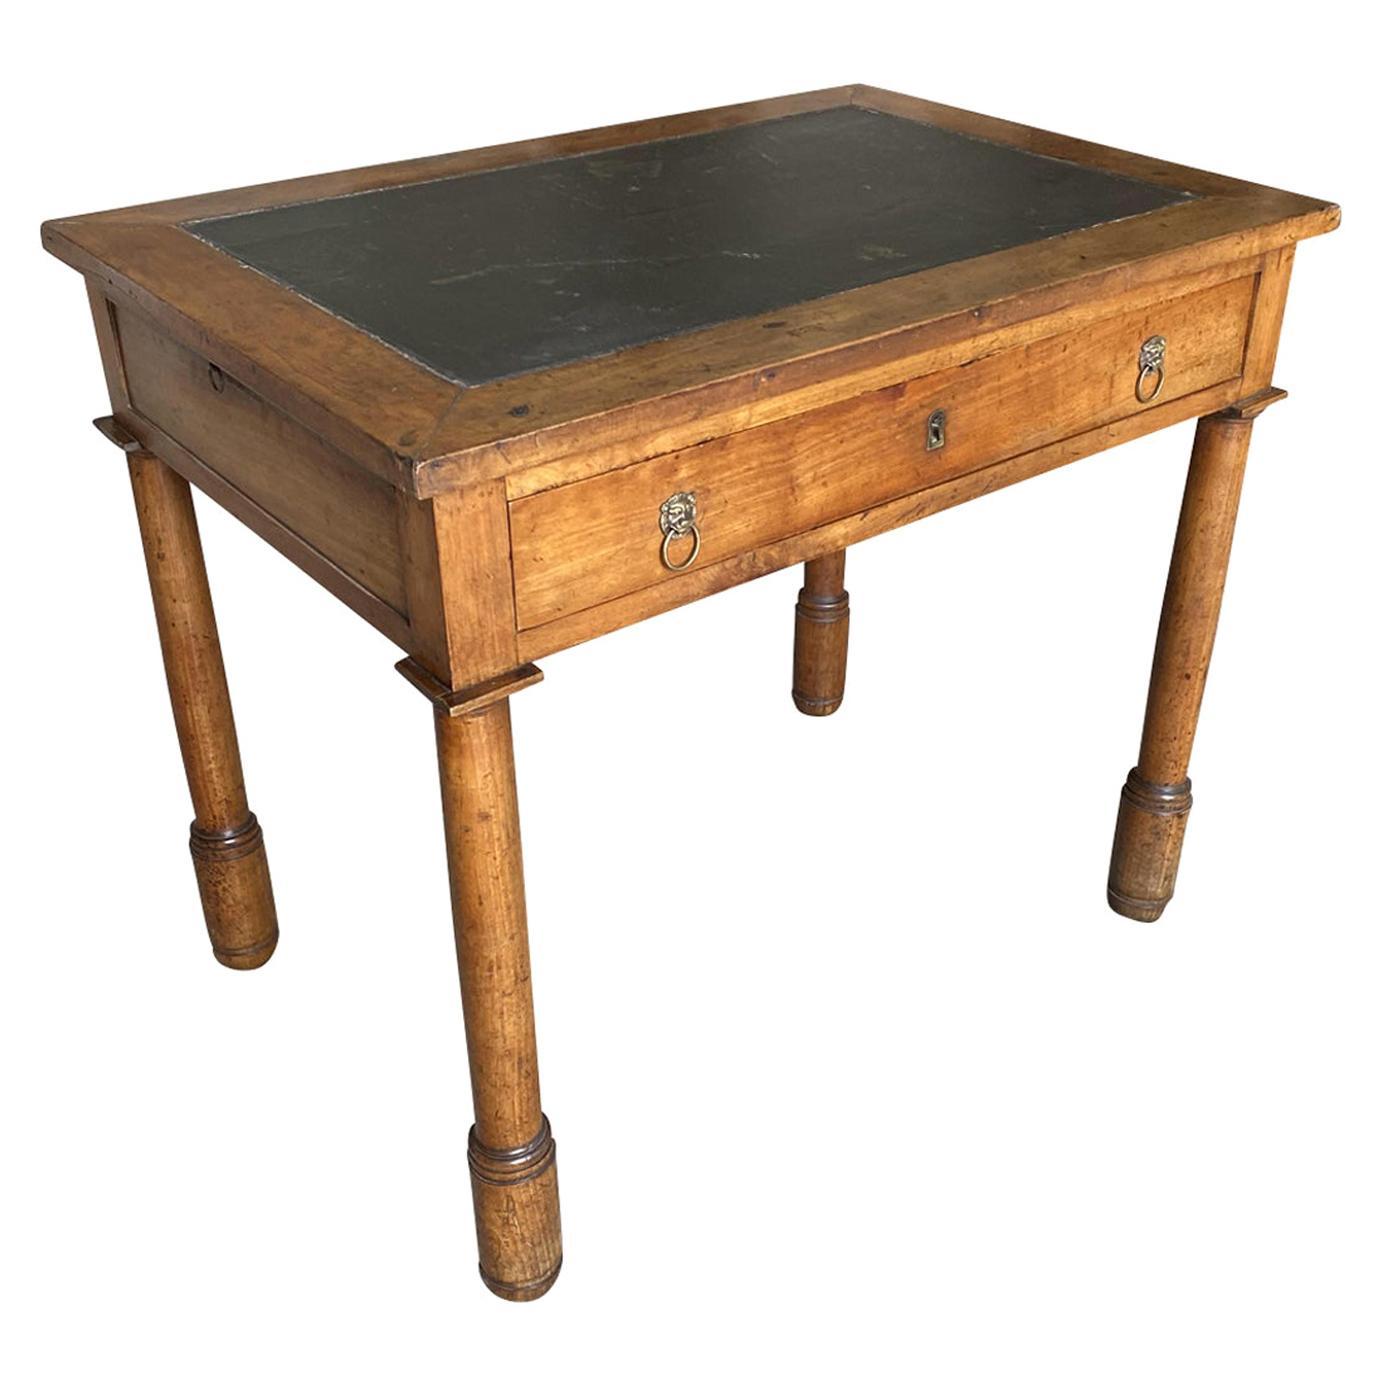 19th Century French Empire Period Writing Desk